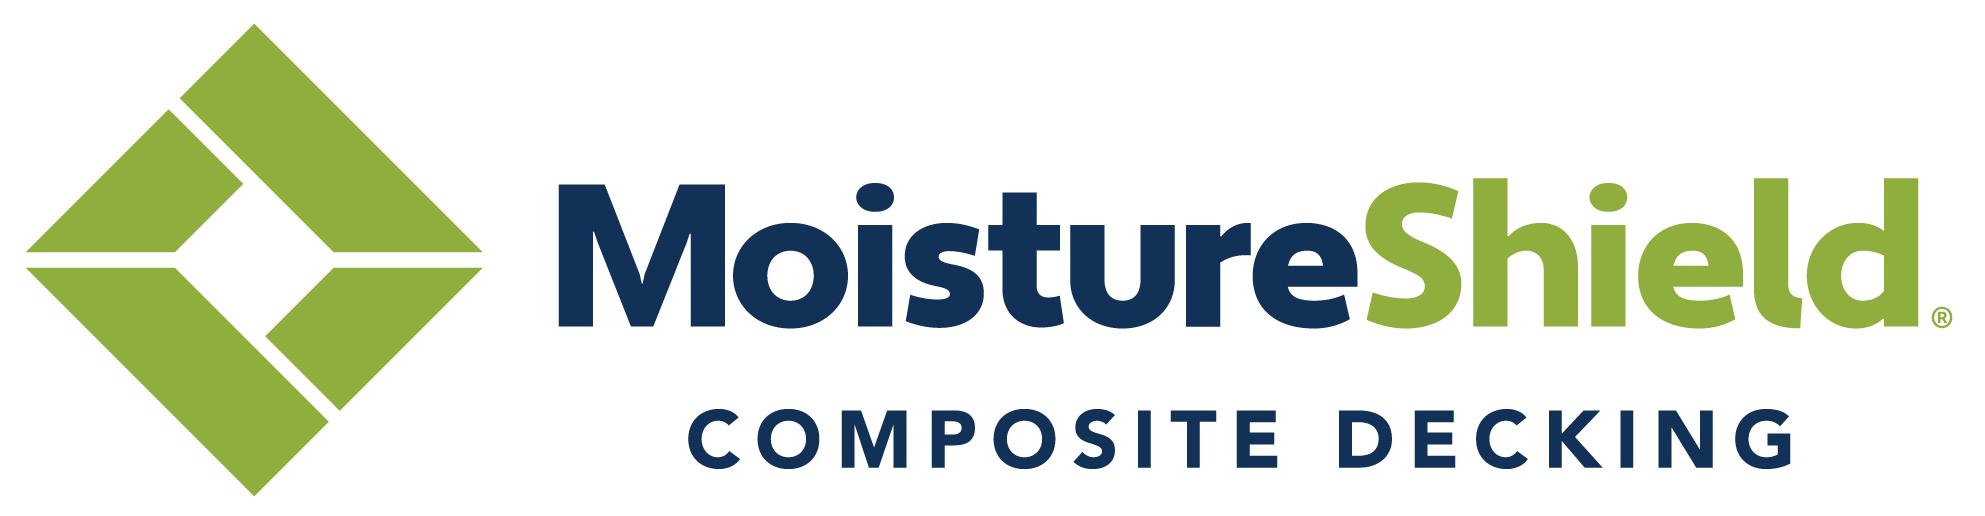 MoistureShield Composite Decking logo blue and green